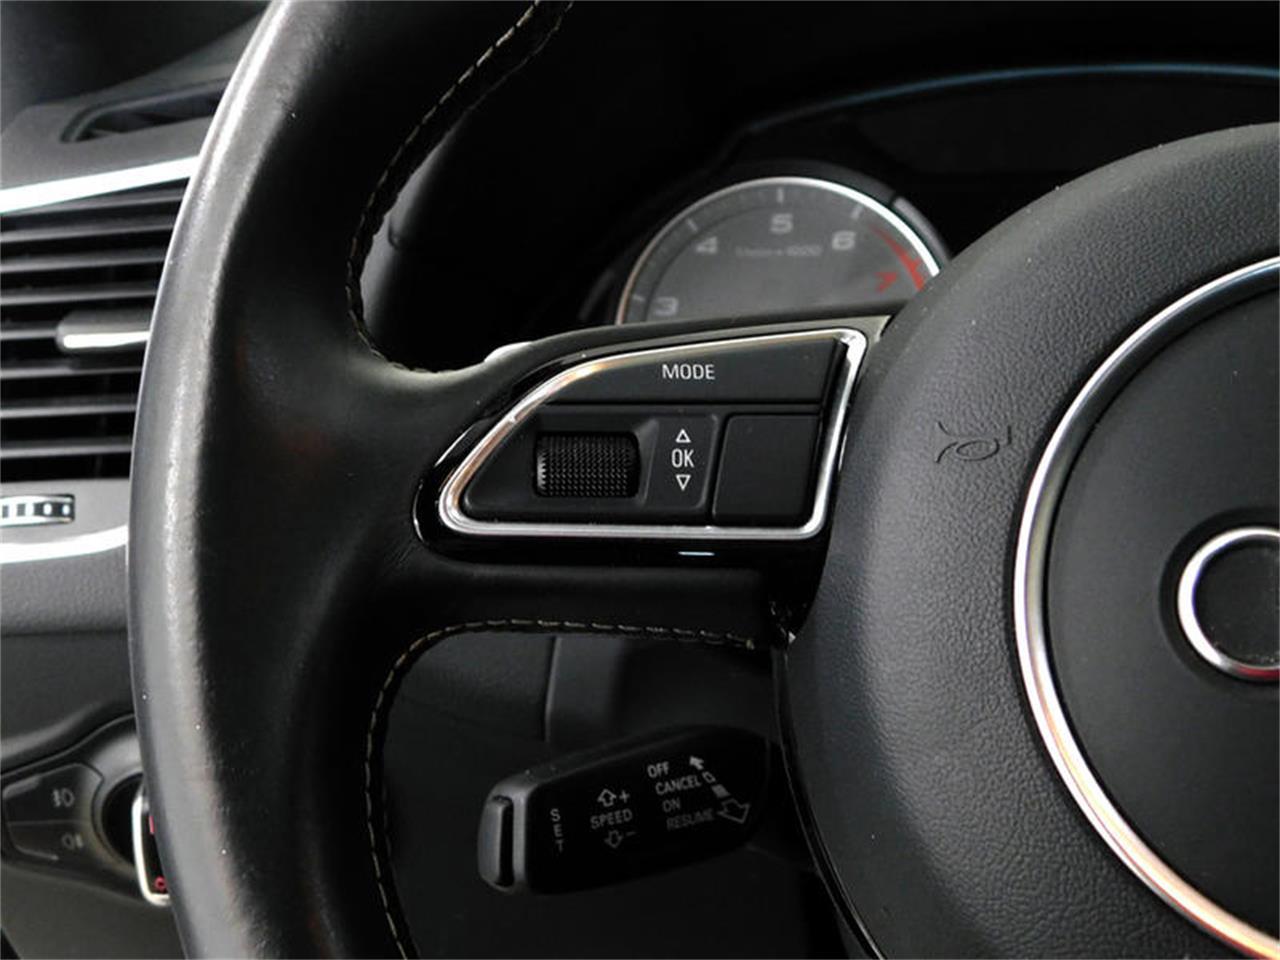 2017 Audi SQ5 (CC-1243010) for sale in Hamburg, New York